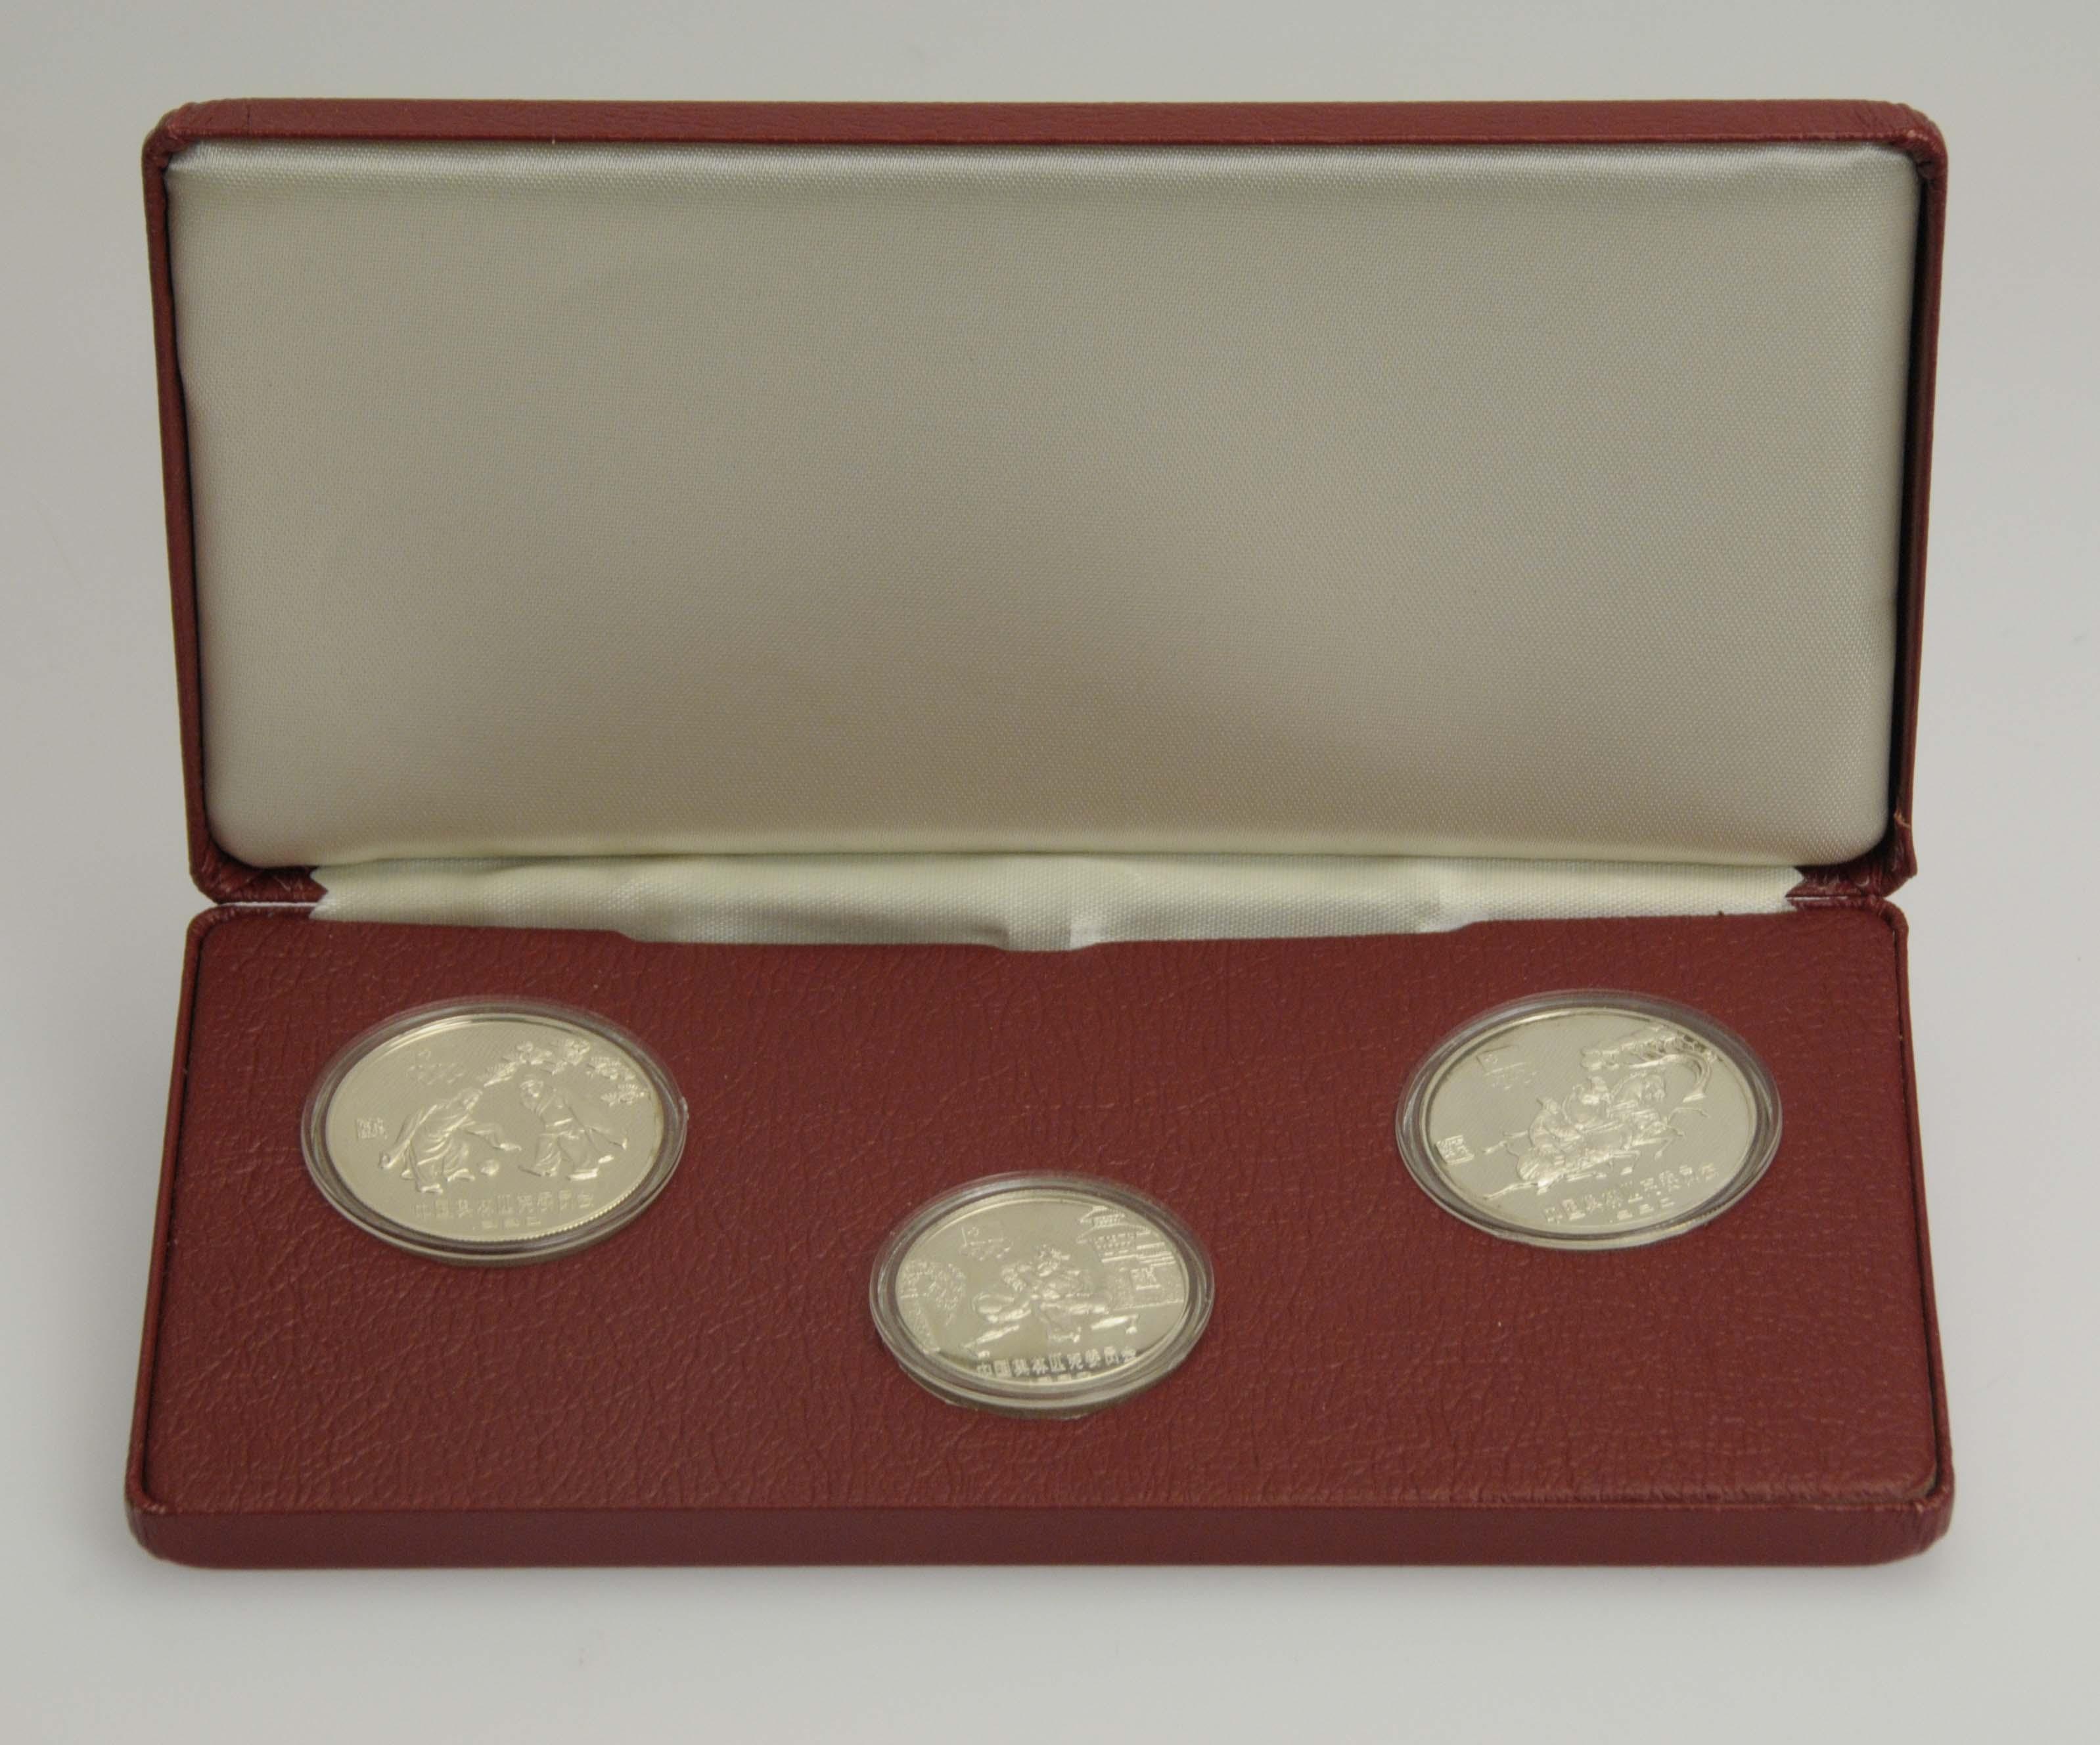 Lot 1898 - übersee China -  Auktionshaus Ulrich Felzmann GmbH & Co. KG Coins single lots